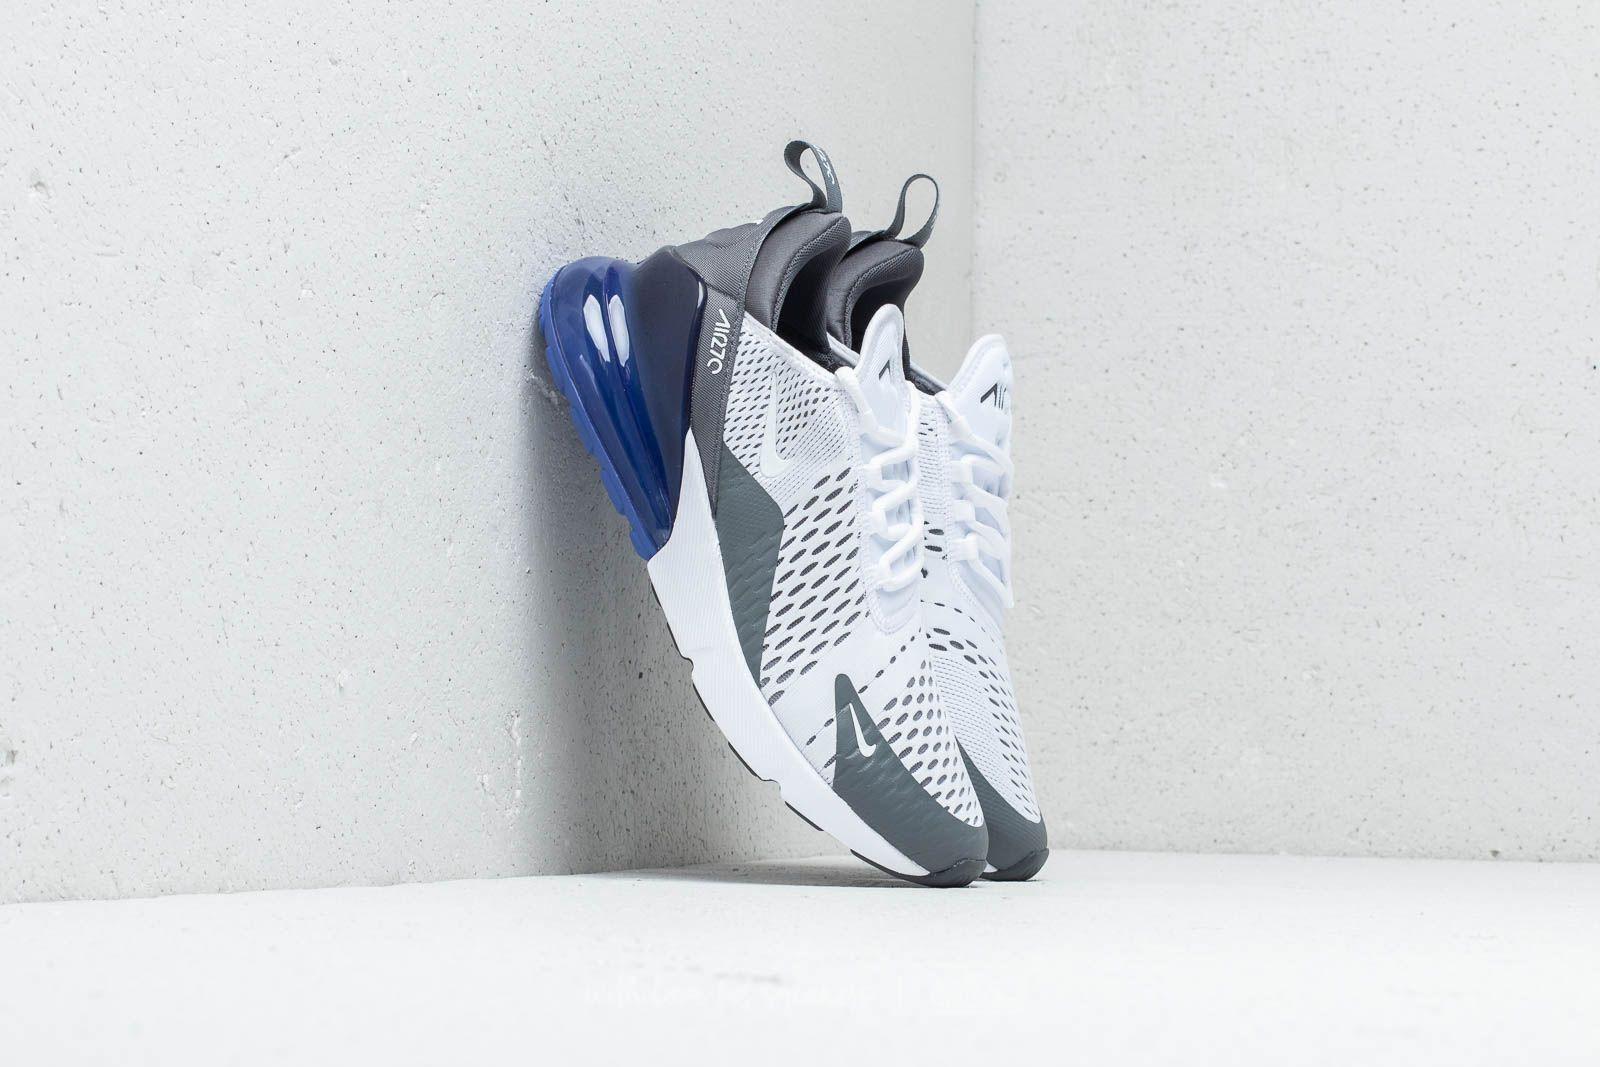 eaa5b56861a792 Nike Air Max 270 White  White-Persian Violet